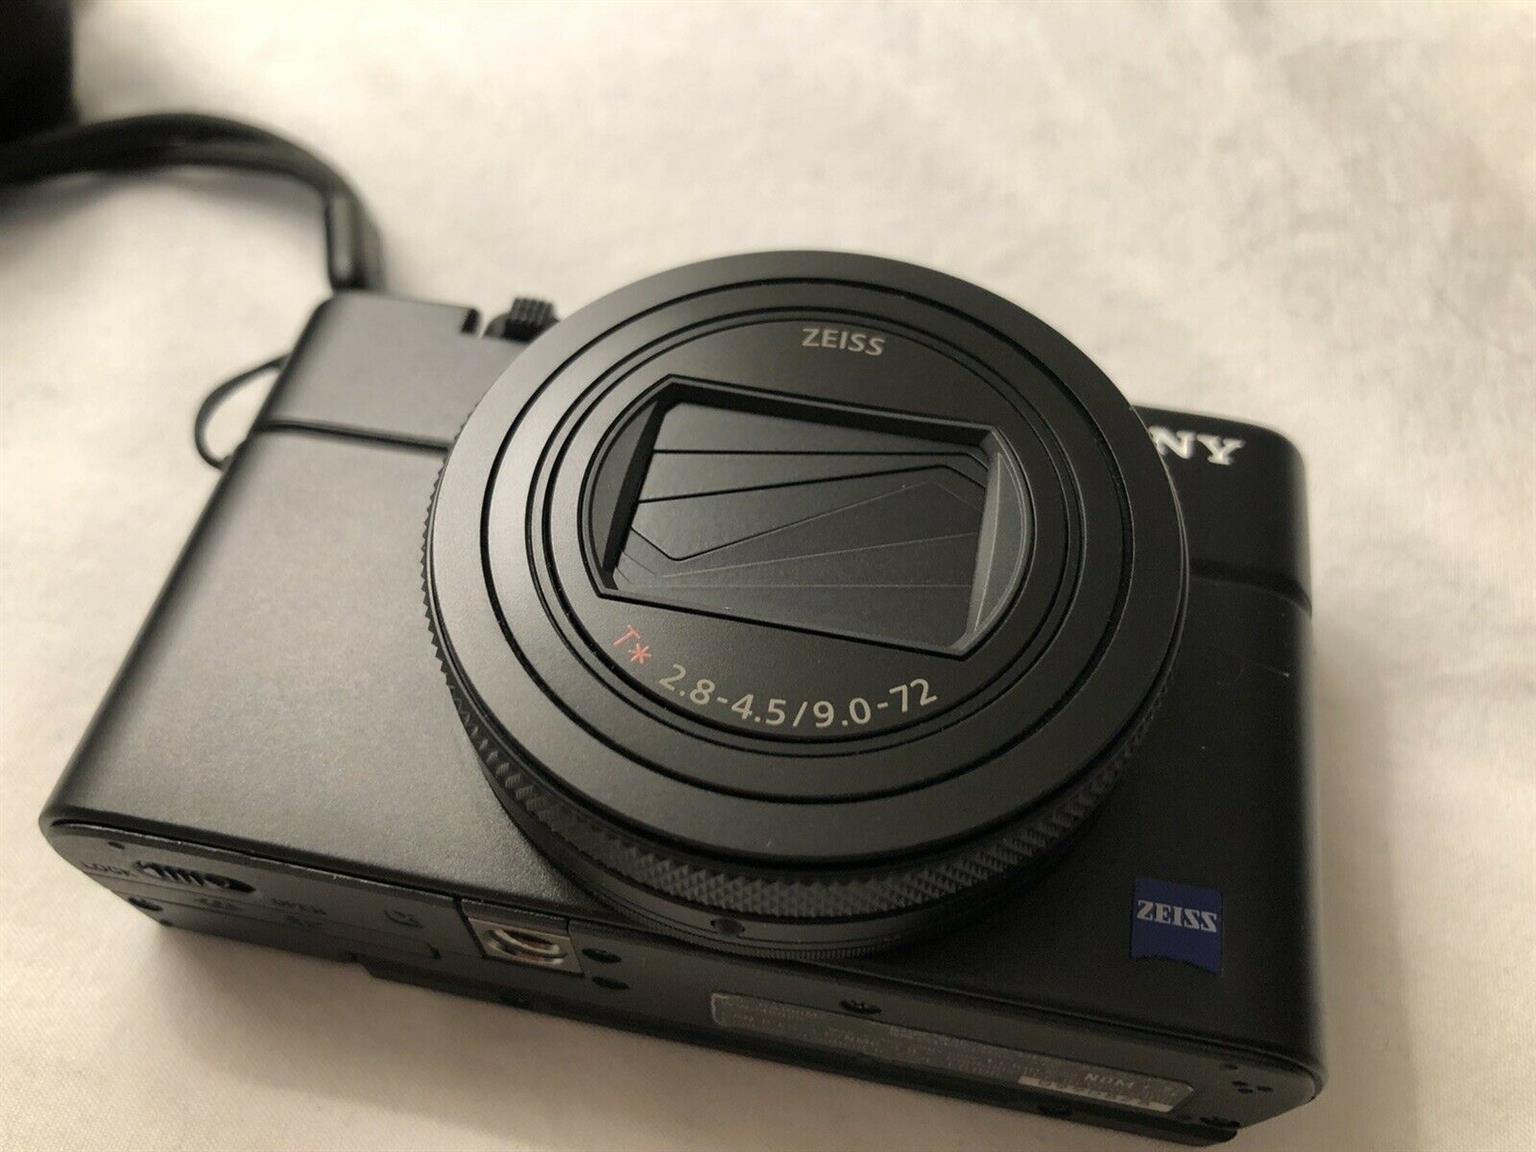 Sony Cyber-shot DSC-RX100 VII Vlogging Camera Kit